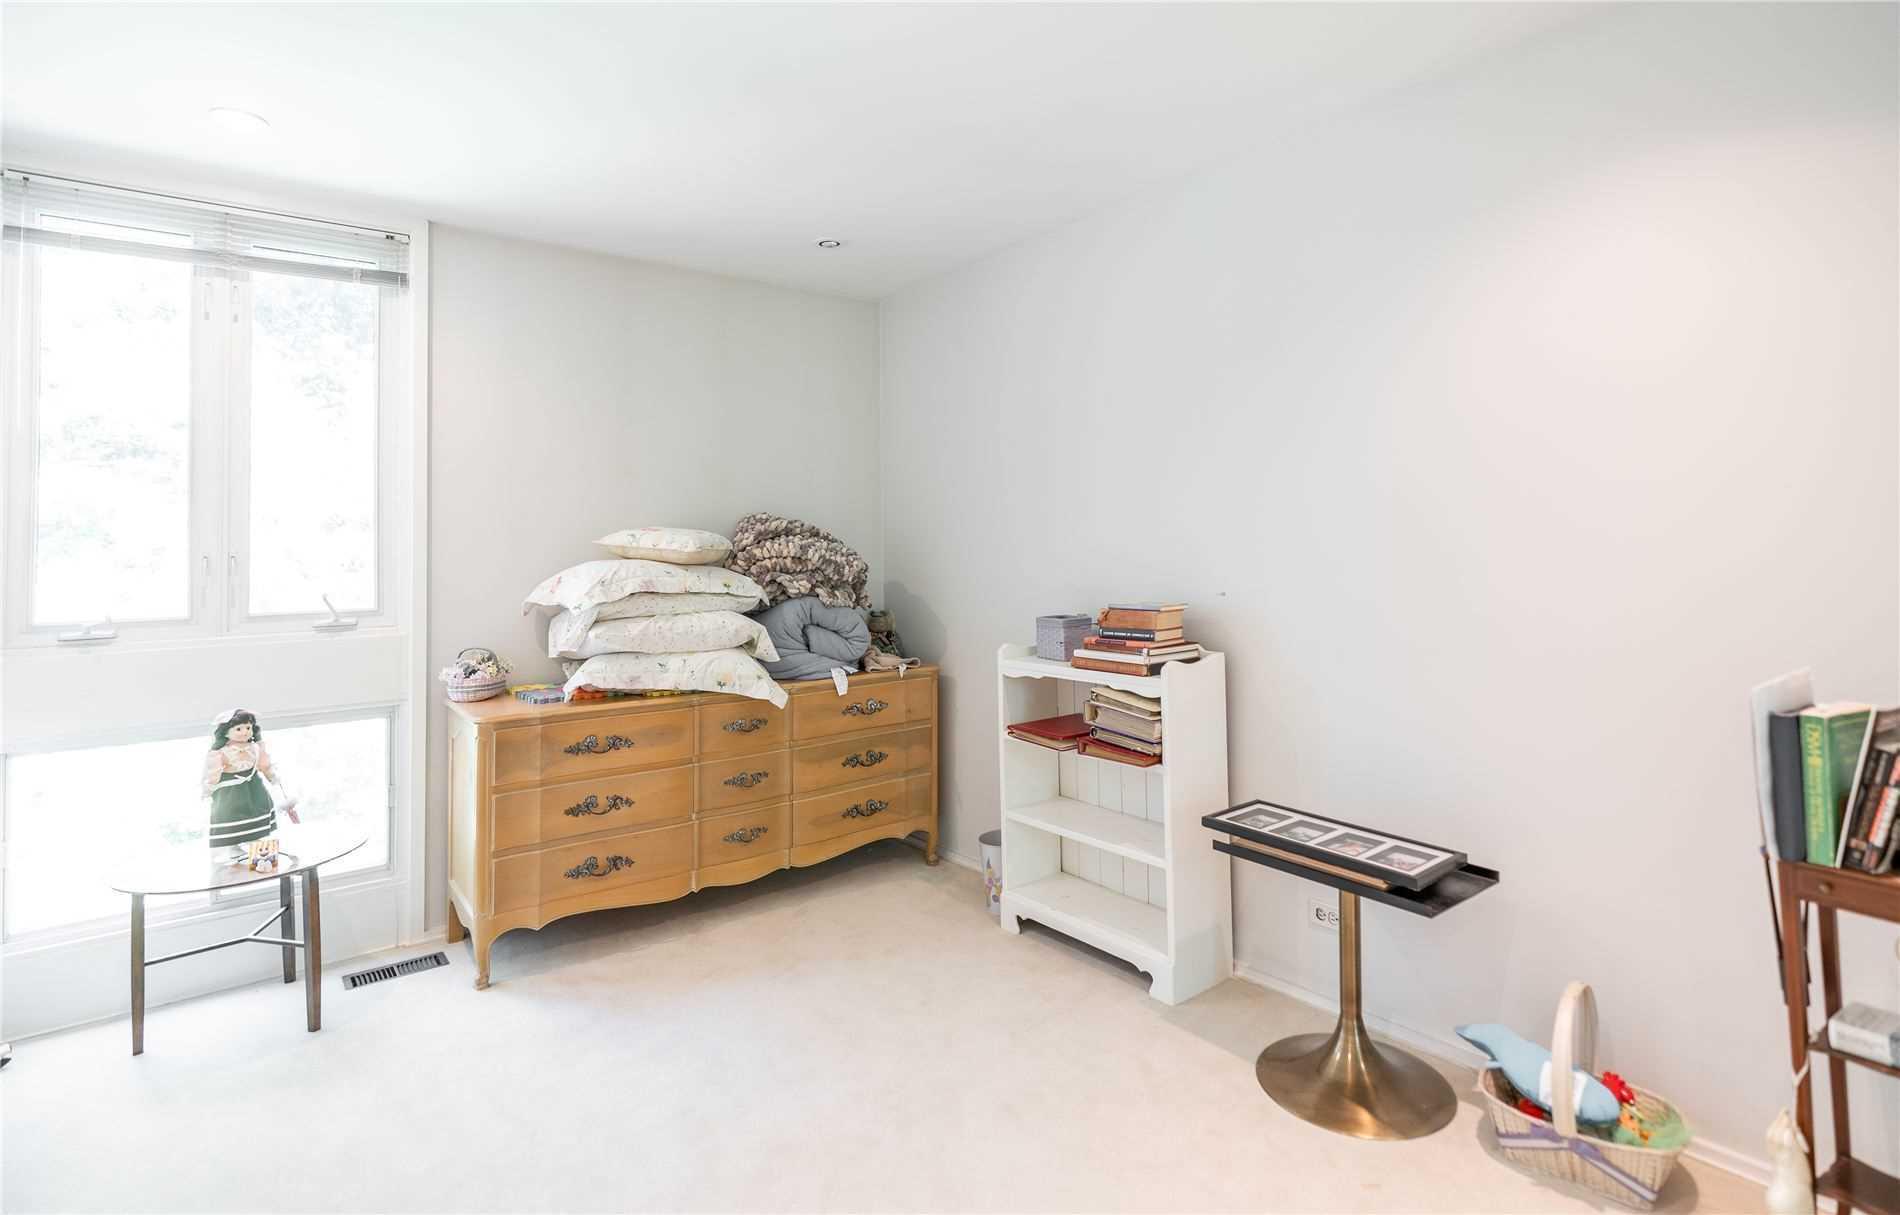 32 Saintfield Ave, Toronto, Ontario M3C2M6, 4 Bedrooms Bedrooms, 12 Rooms Rooms,4 BathroomsBathrooms,Detached,For Sale,Saintfield,C5362404